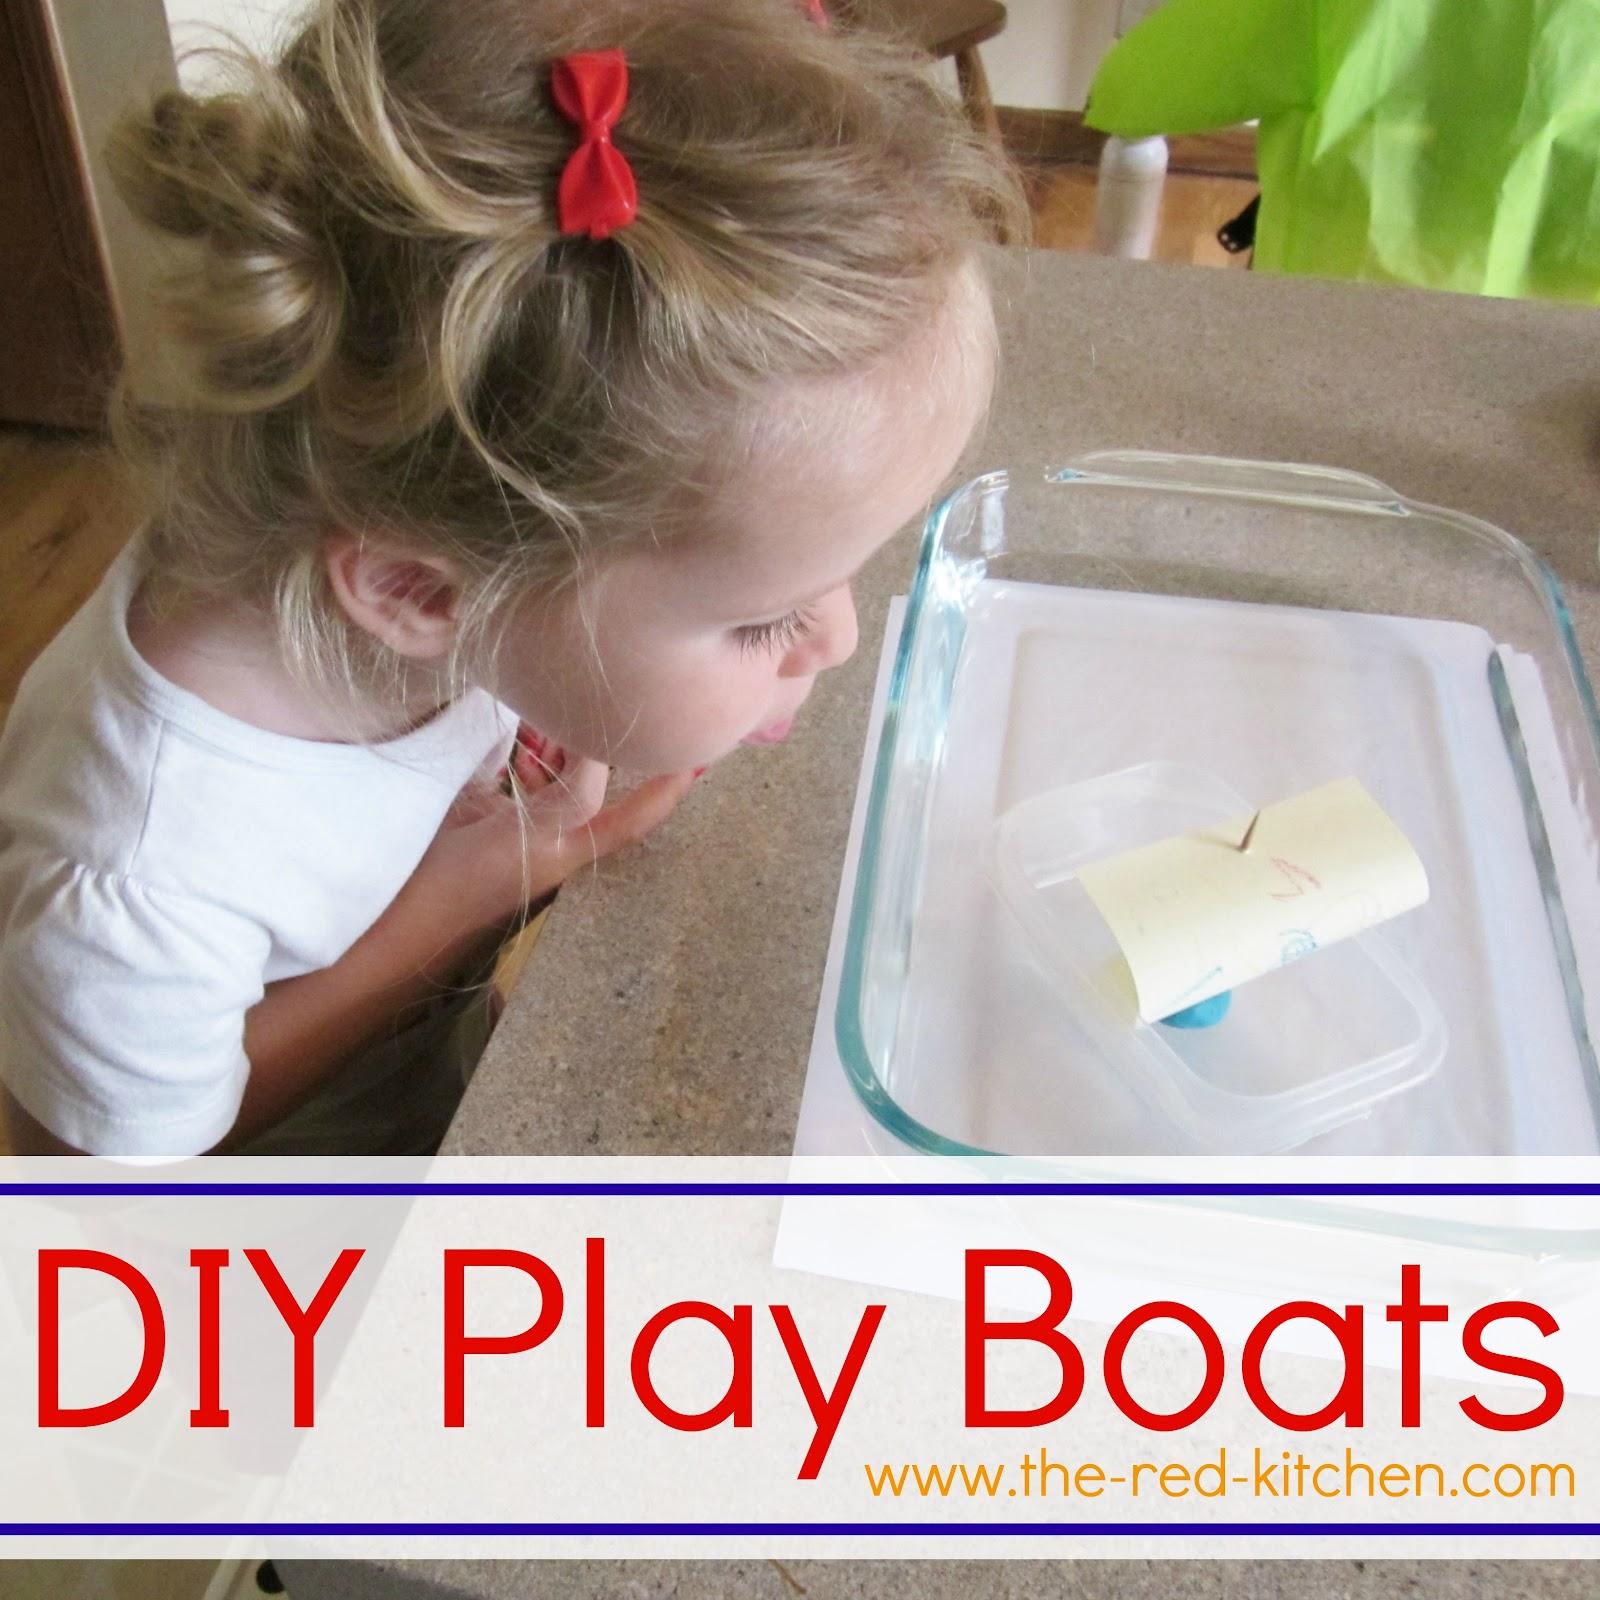 DIY Play Boats Mini Tutorial Preschool Activity